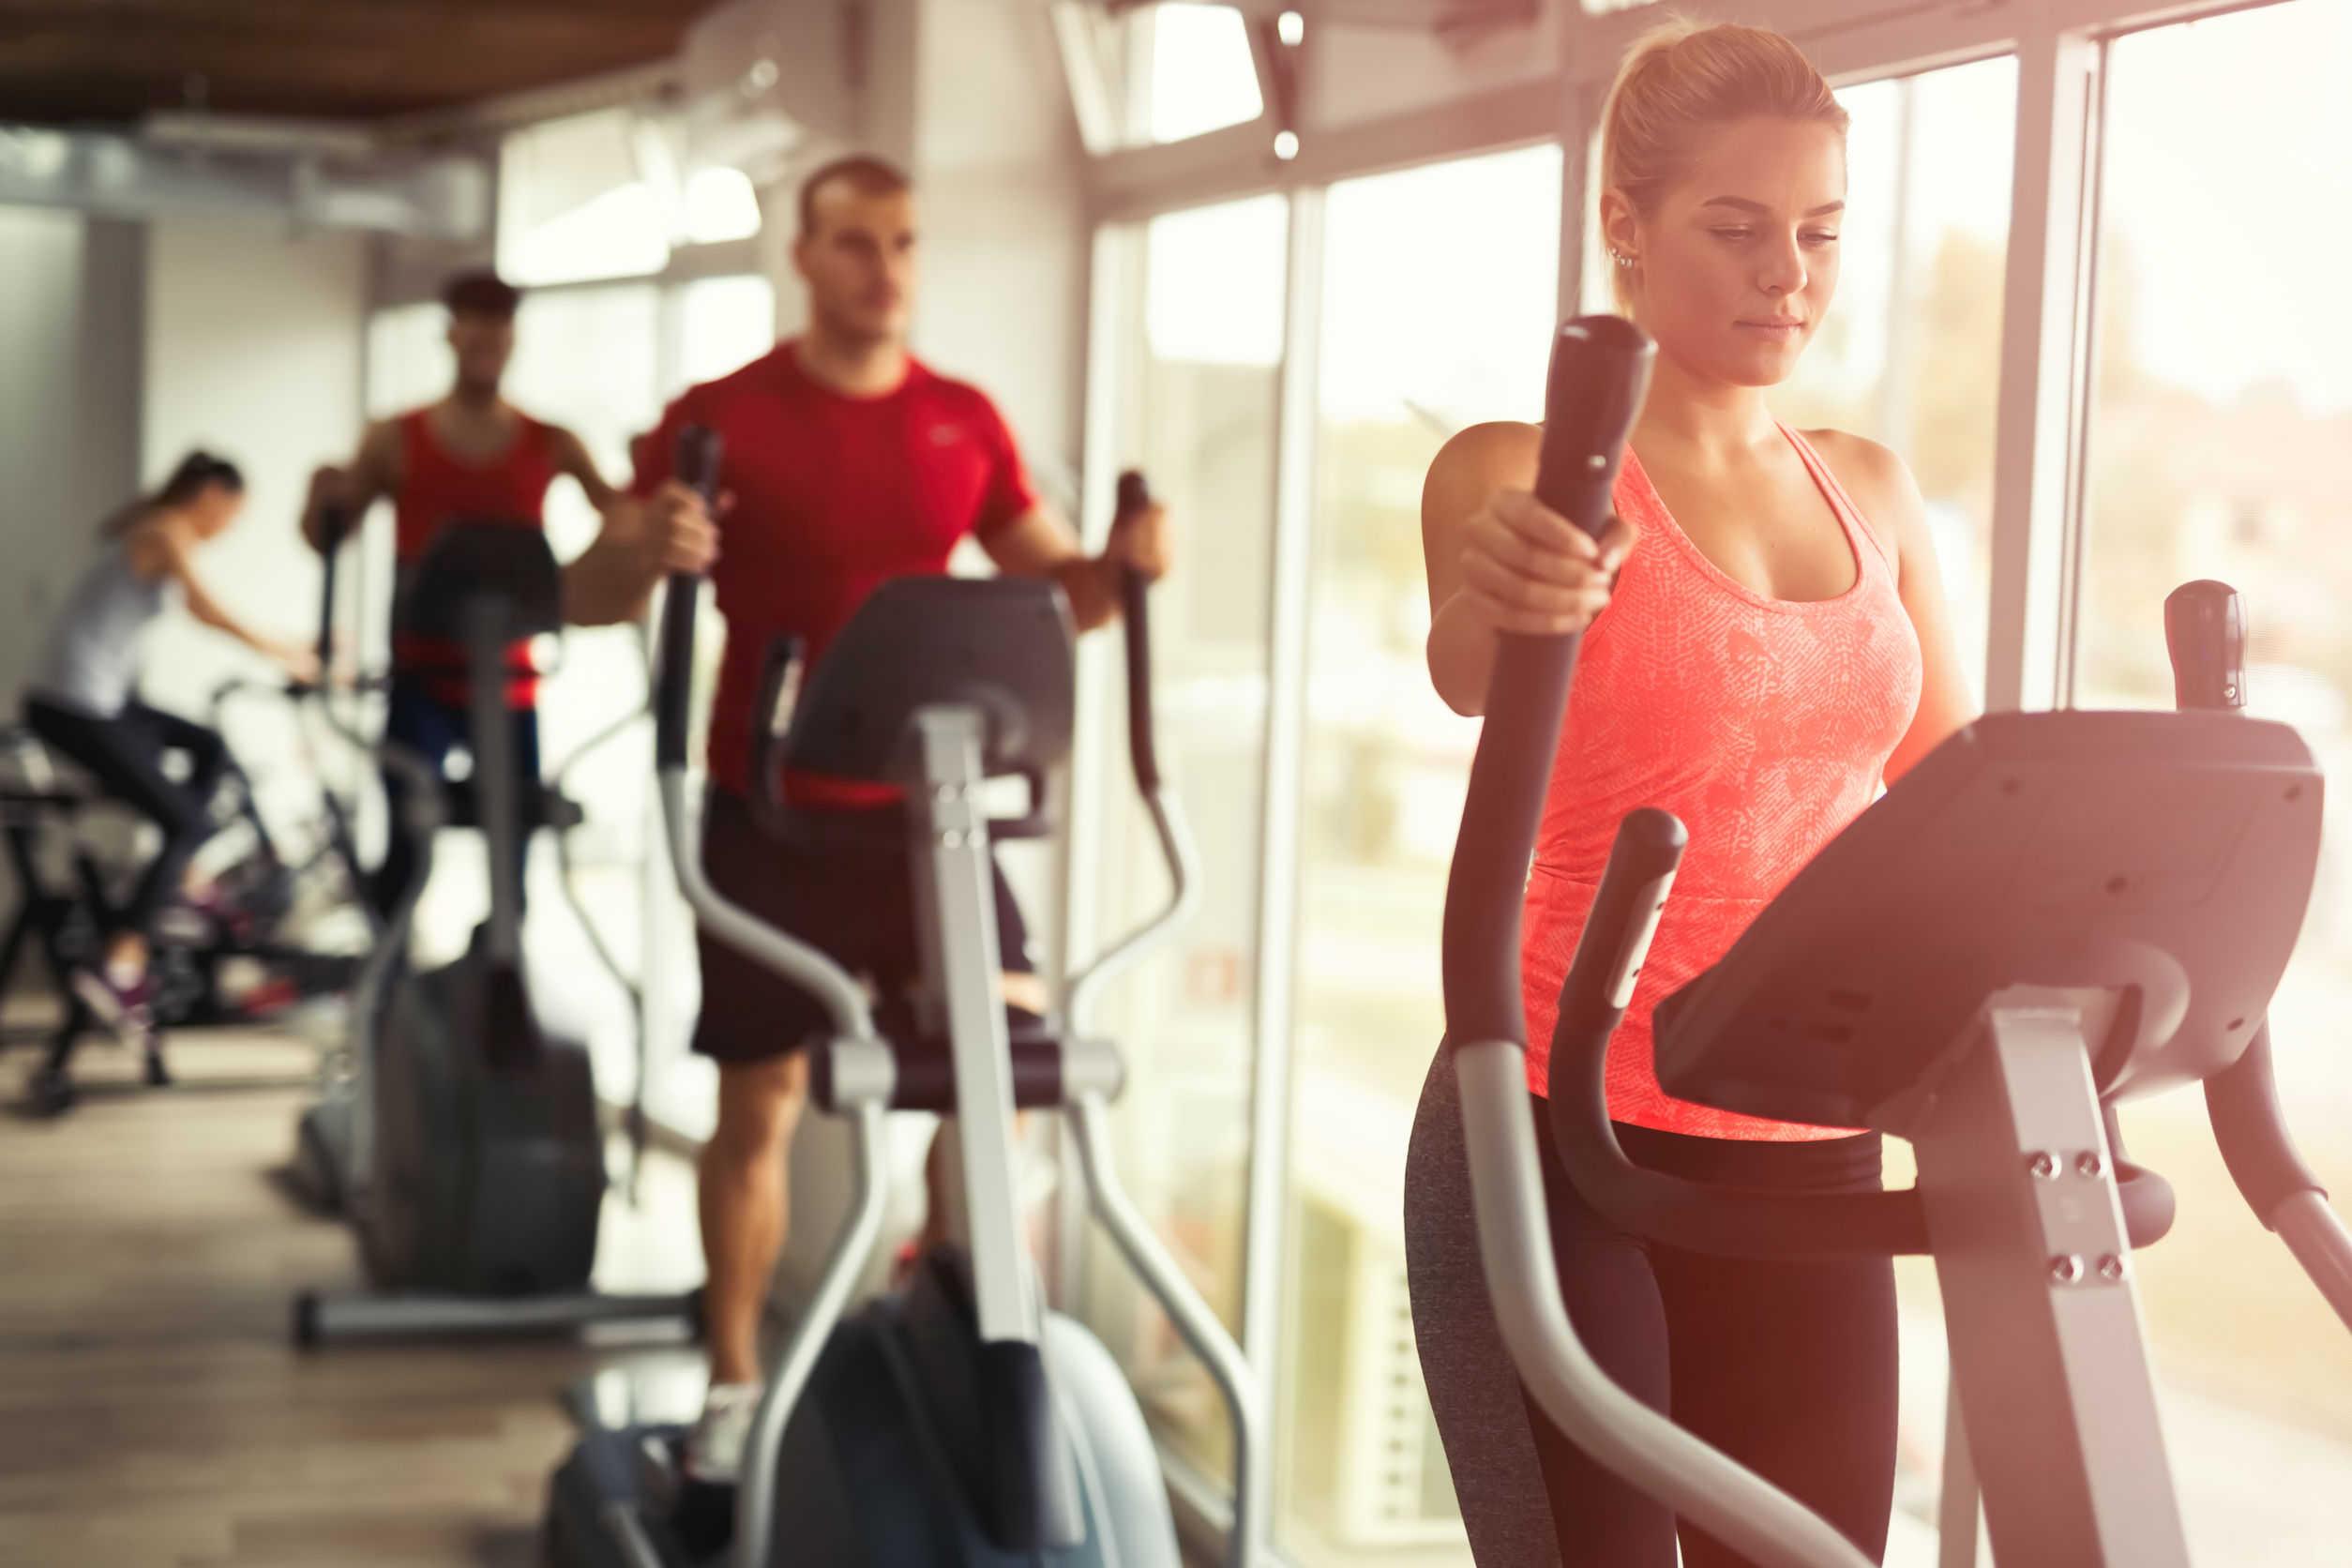 Fitness & Jogging Croß Trainer Kettler Gute QualitäT Crosstrainer